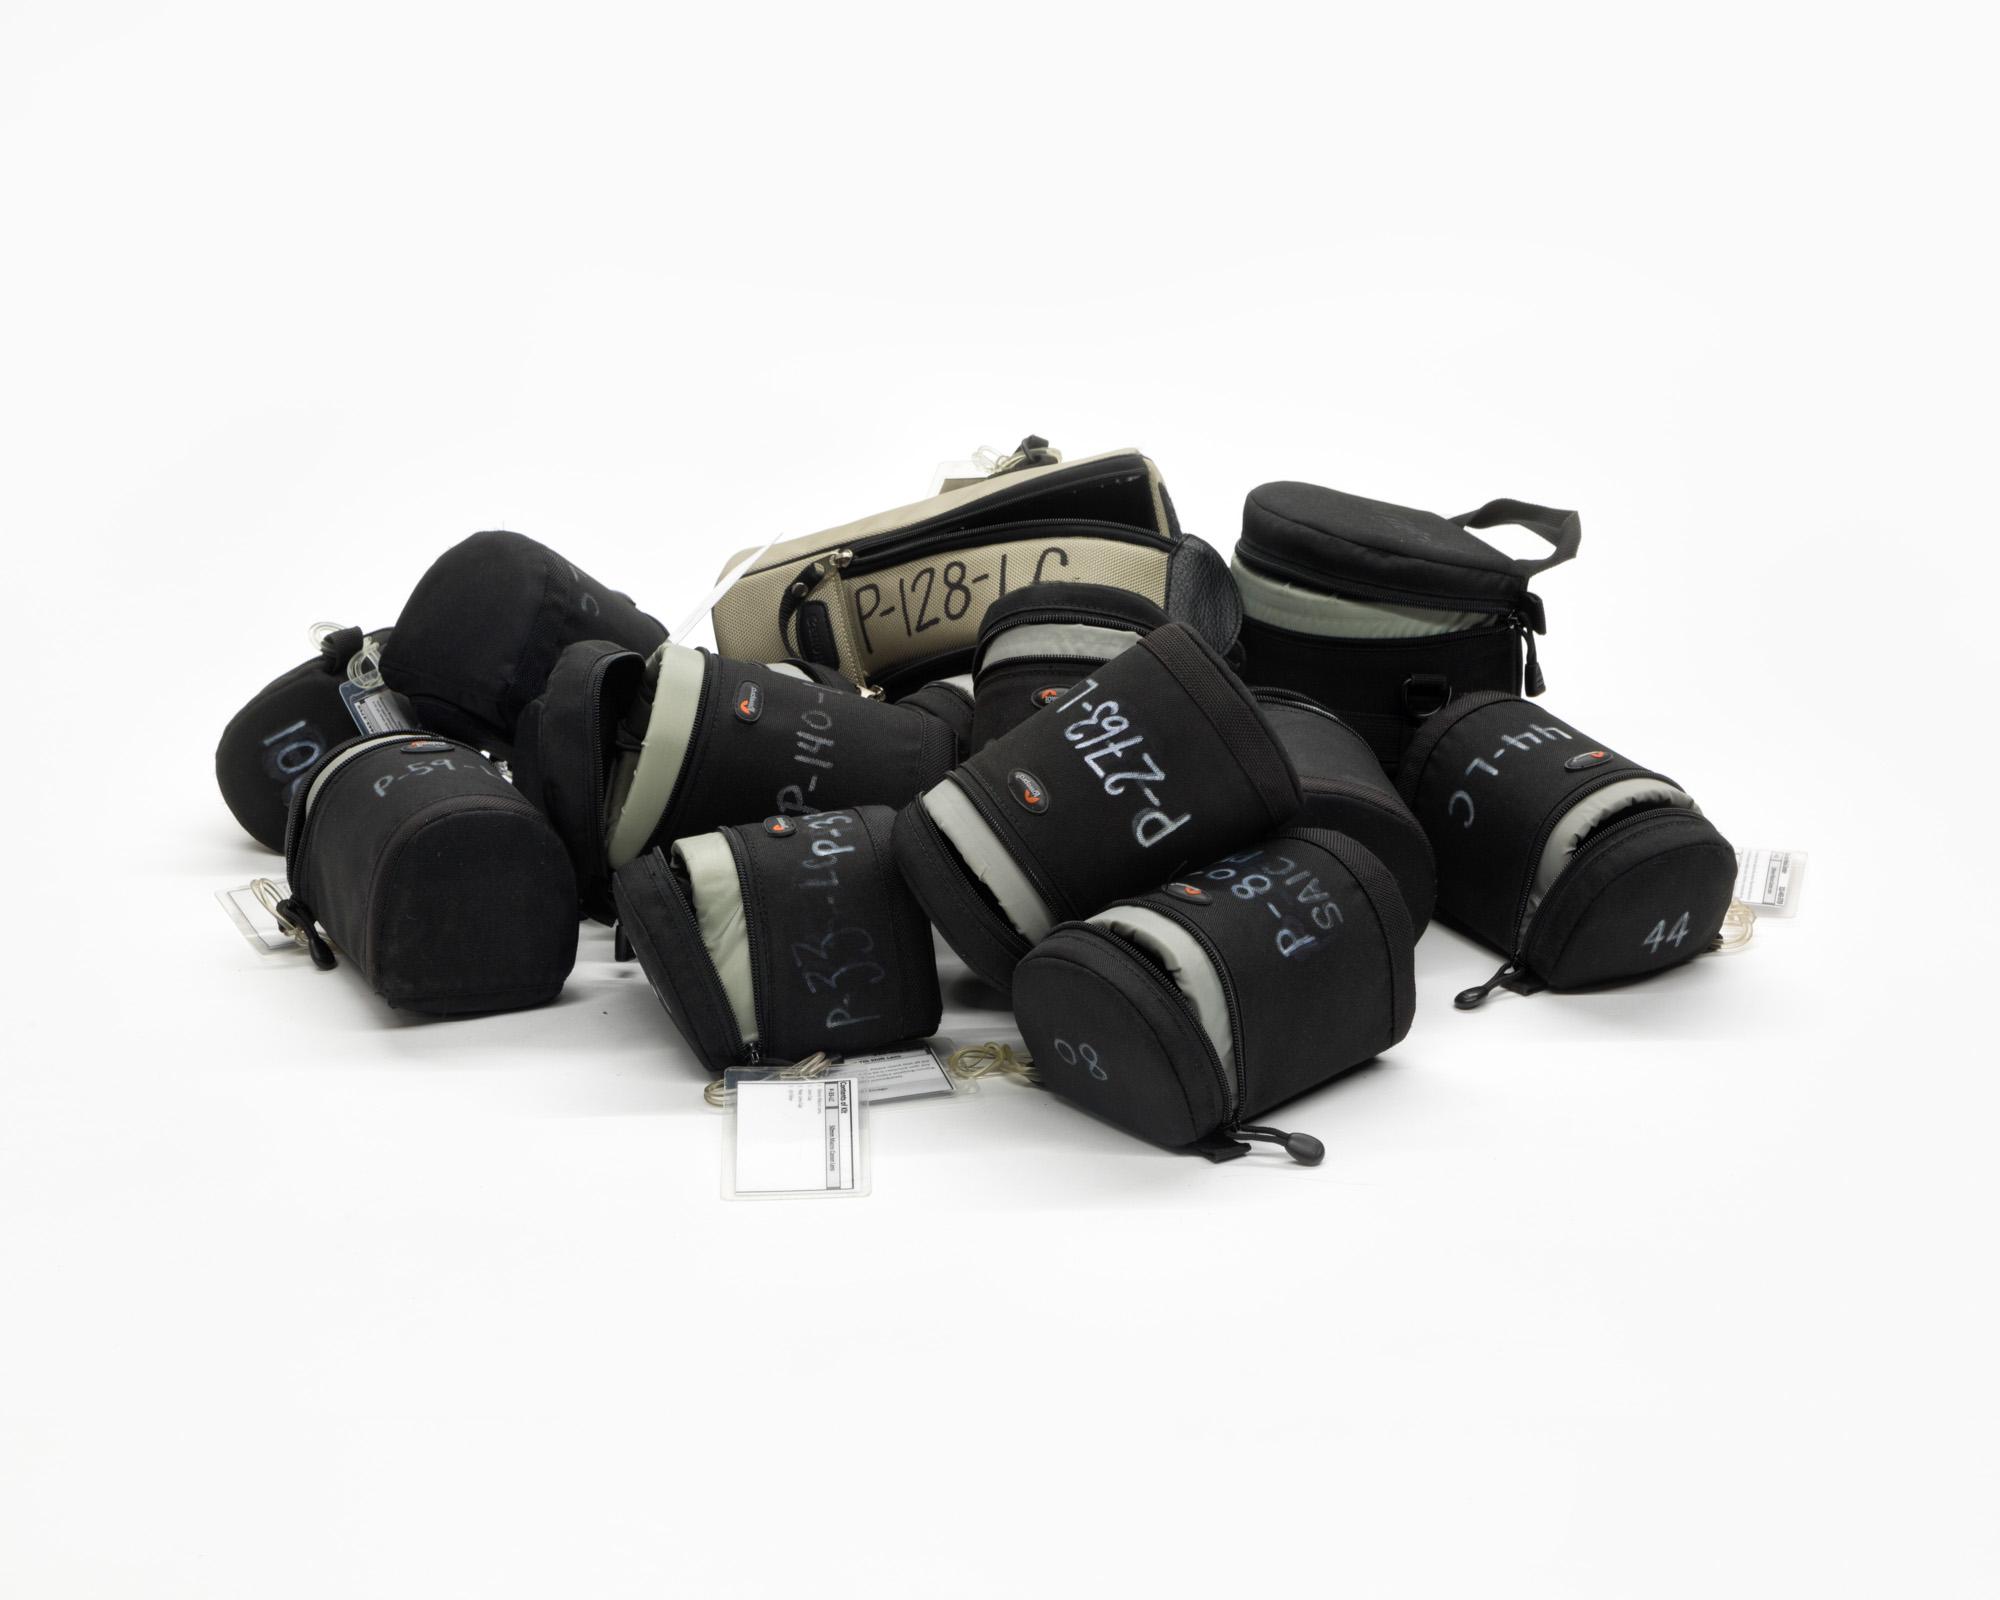 Twelve Lens Cases